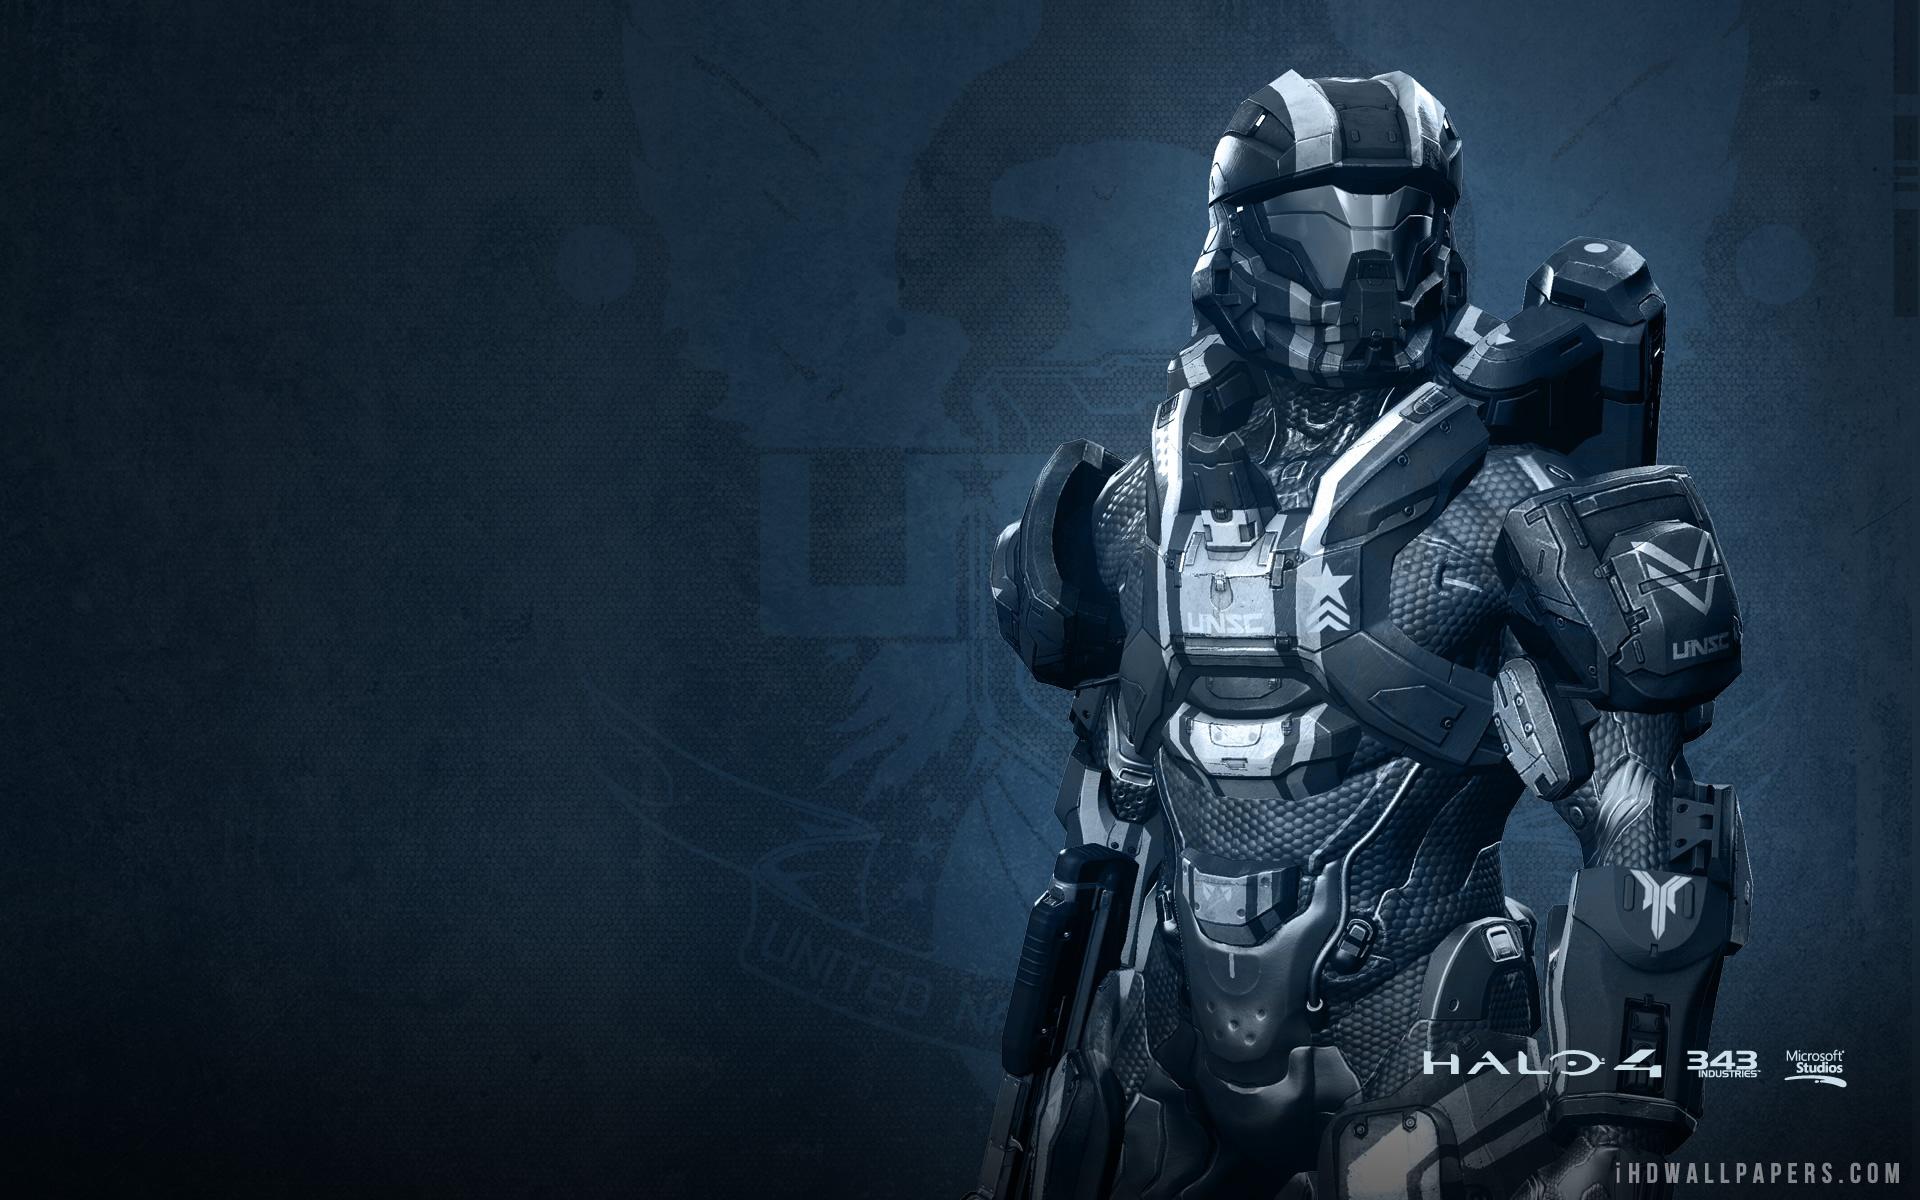 Master Chief And Cortana Halo 4 Wallpaper Halo chief master 1920x1200